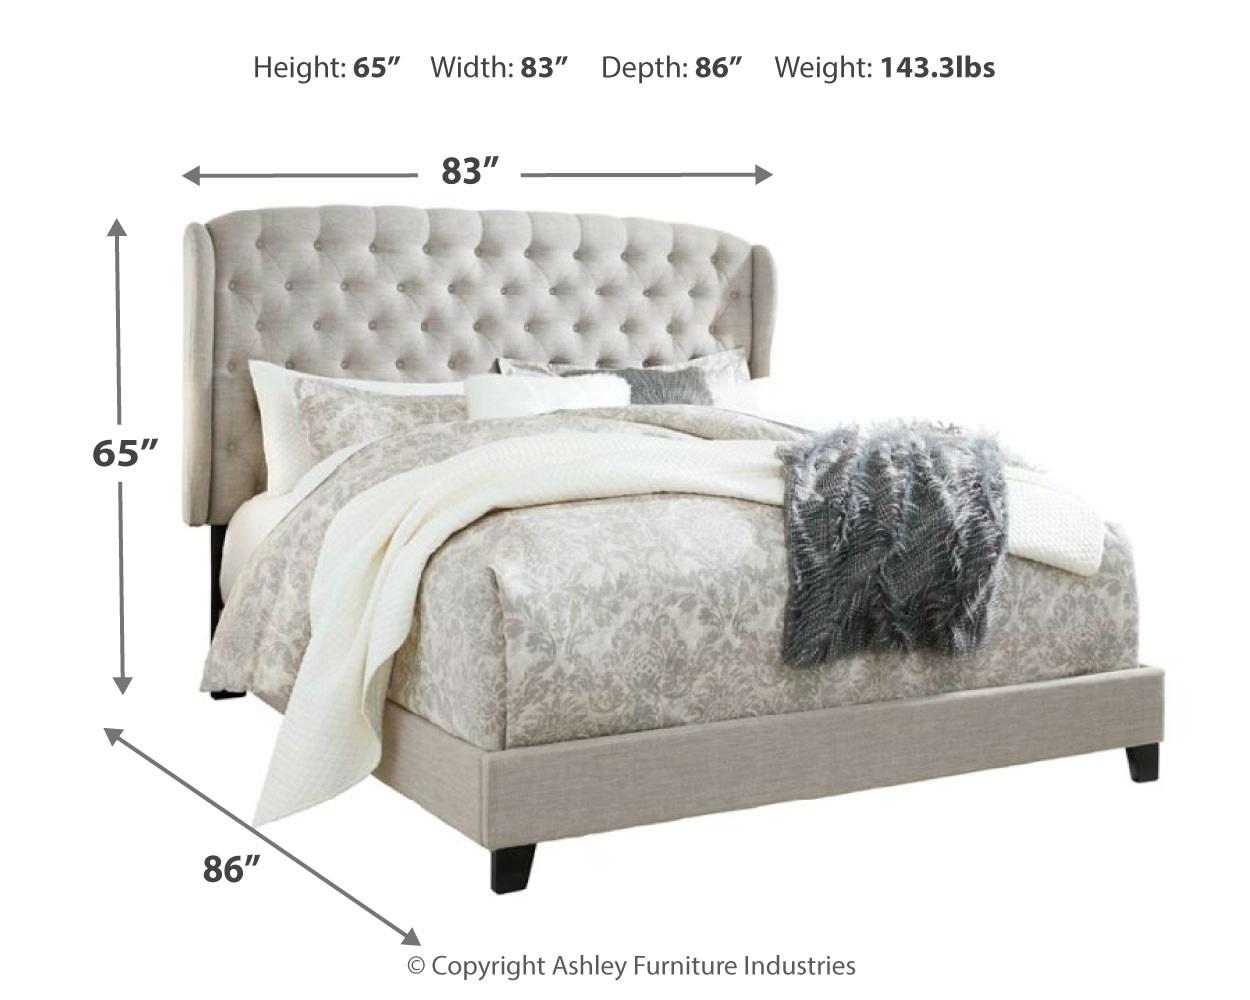 Signature Design King Upholstered Bedframe, Jerary, Light Gray, B090-982